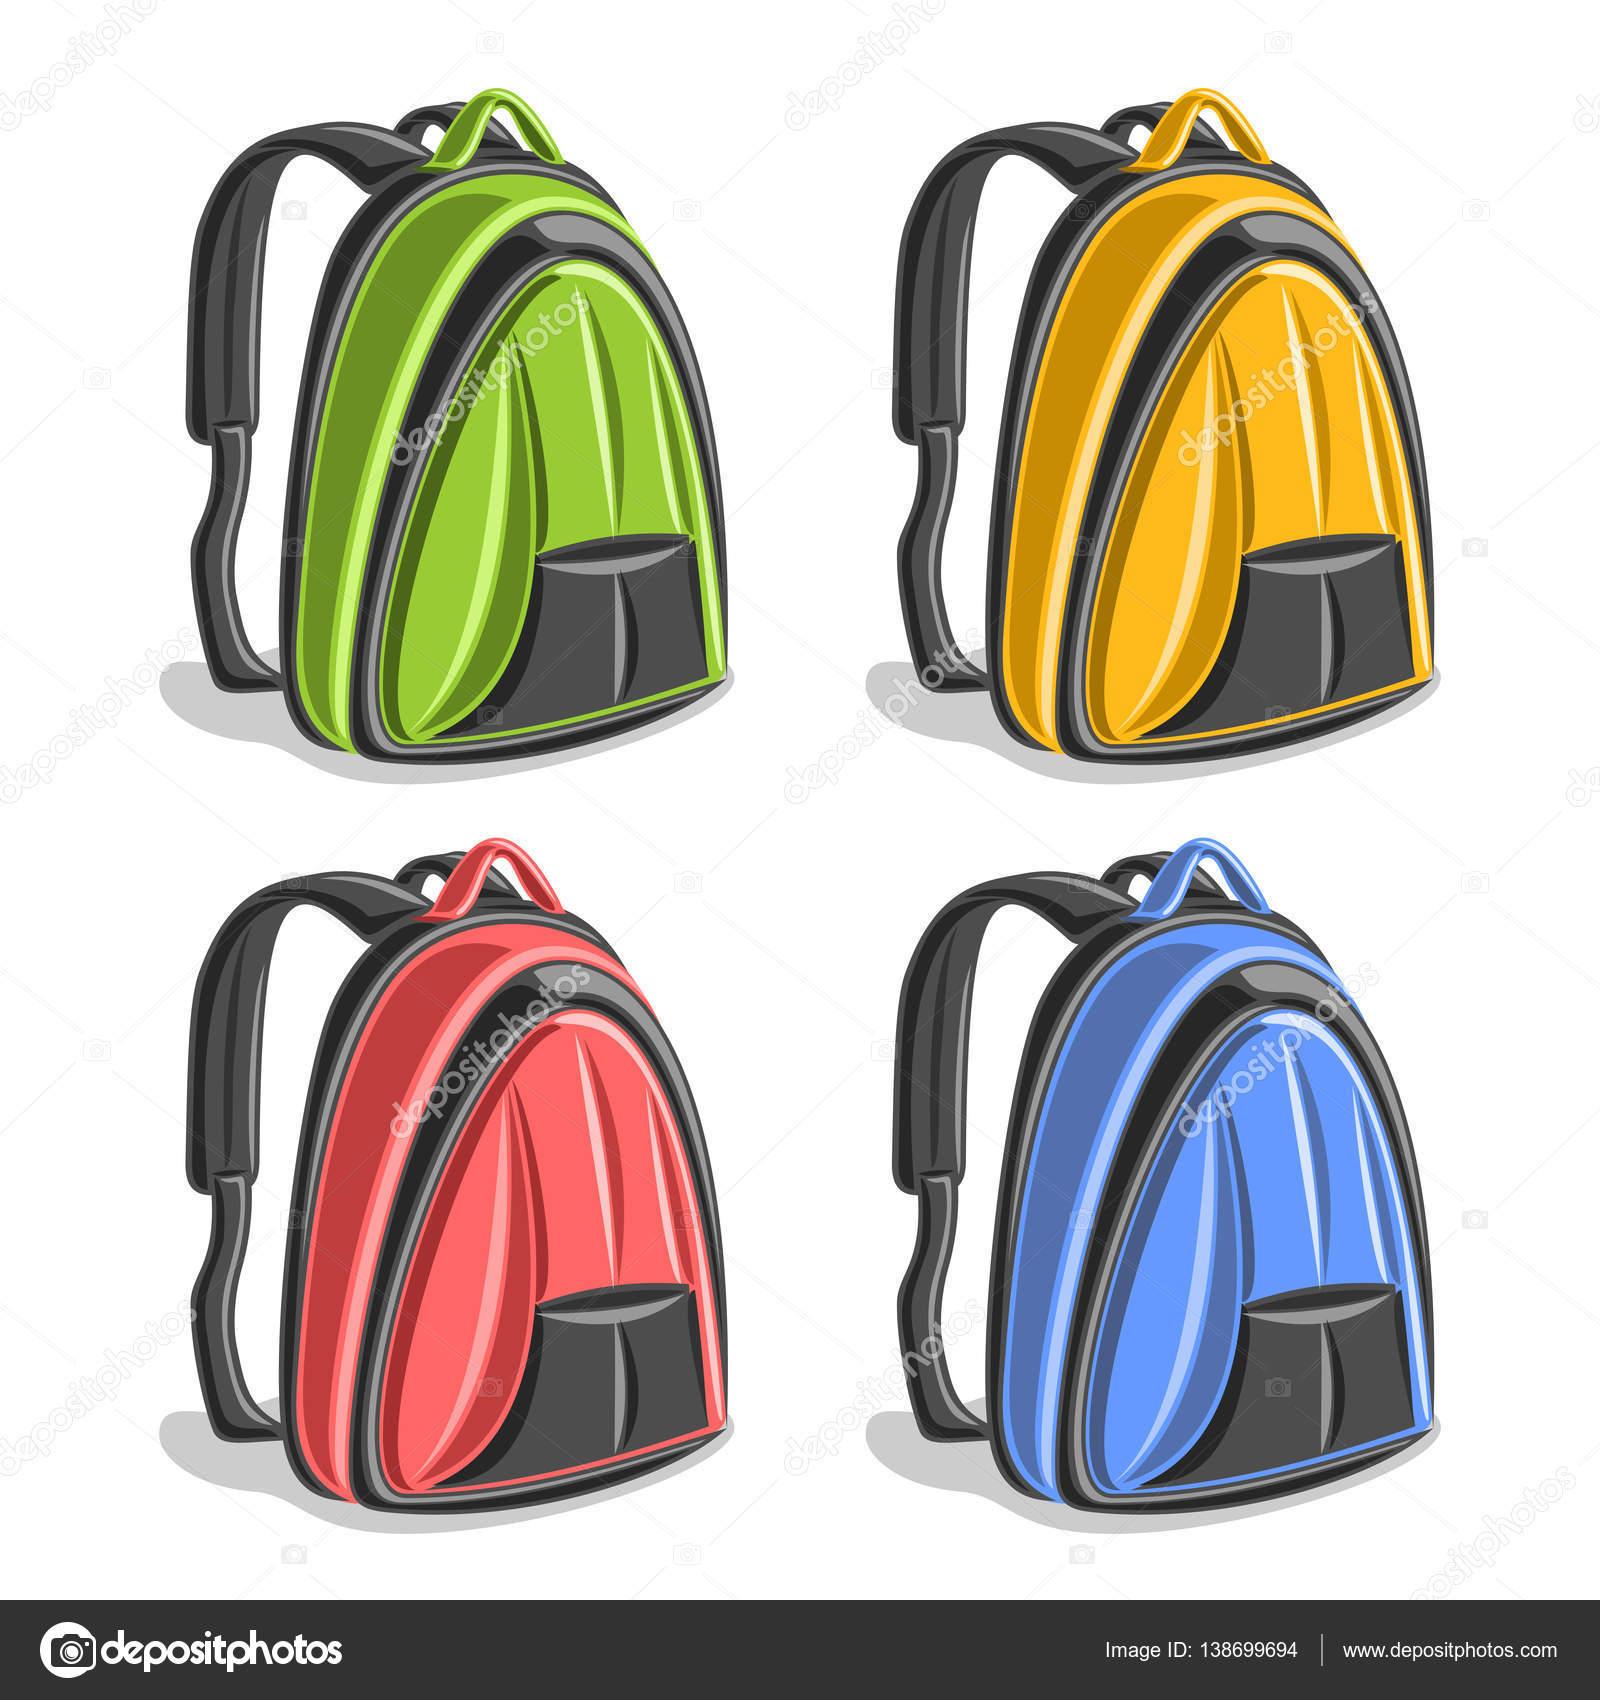 27064a7d62 Διάνυσμα σύνολο πολύχρωμο πεζοπορία σακίδια — Διανυσματικό Αρχείο ...